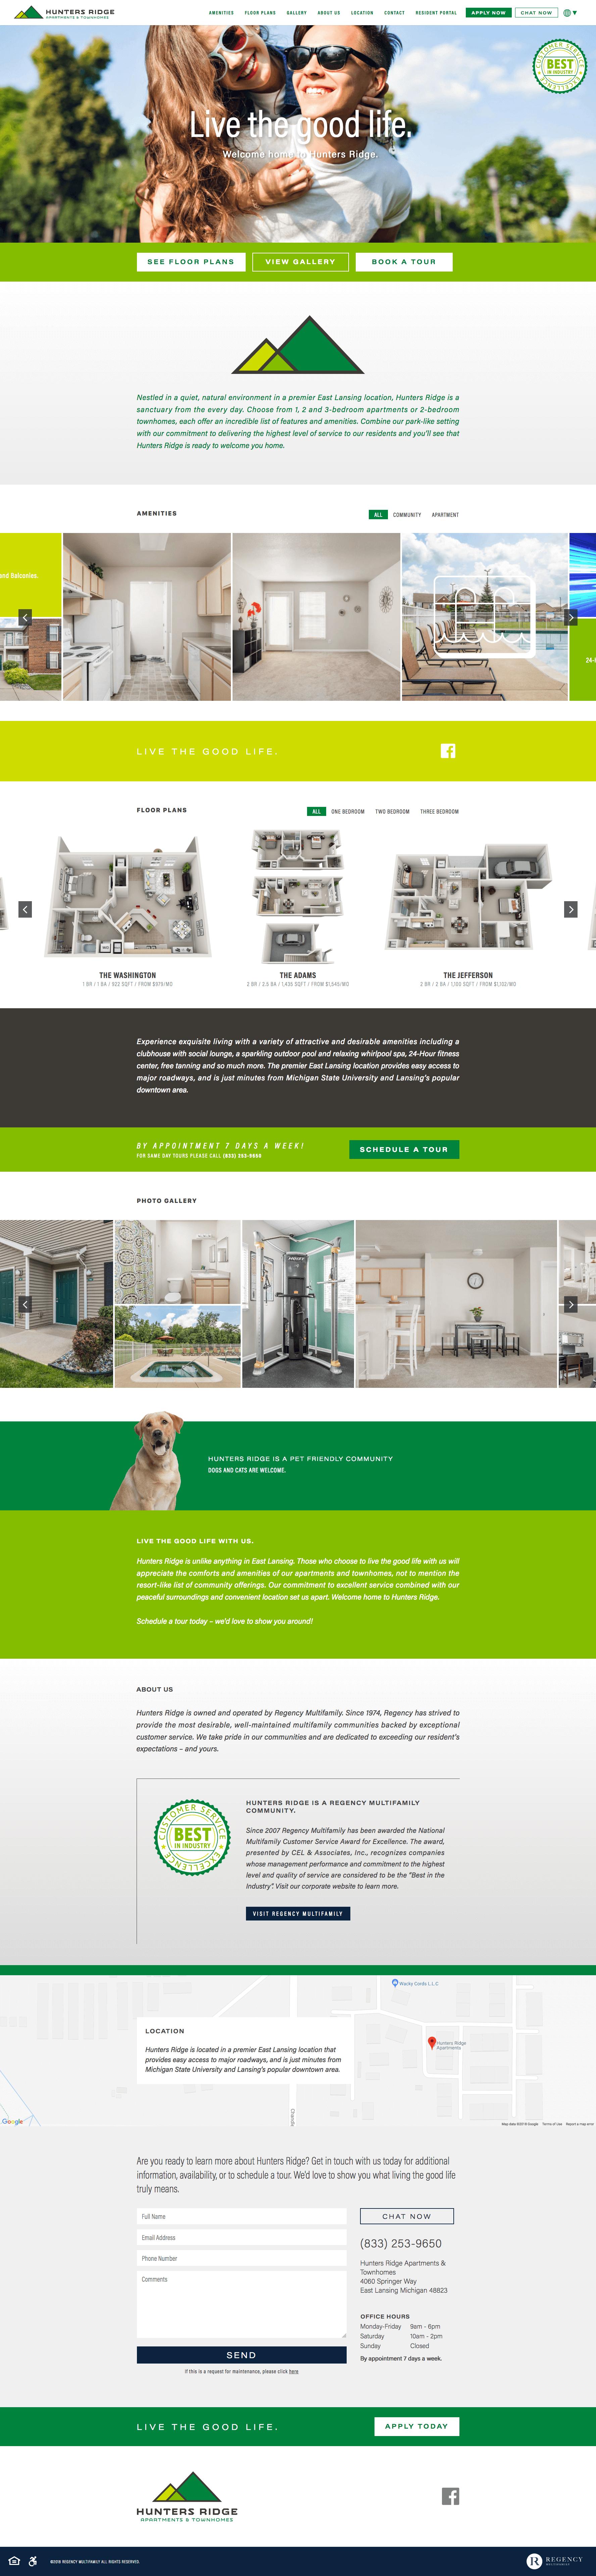 Regency - Property Websites